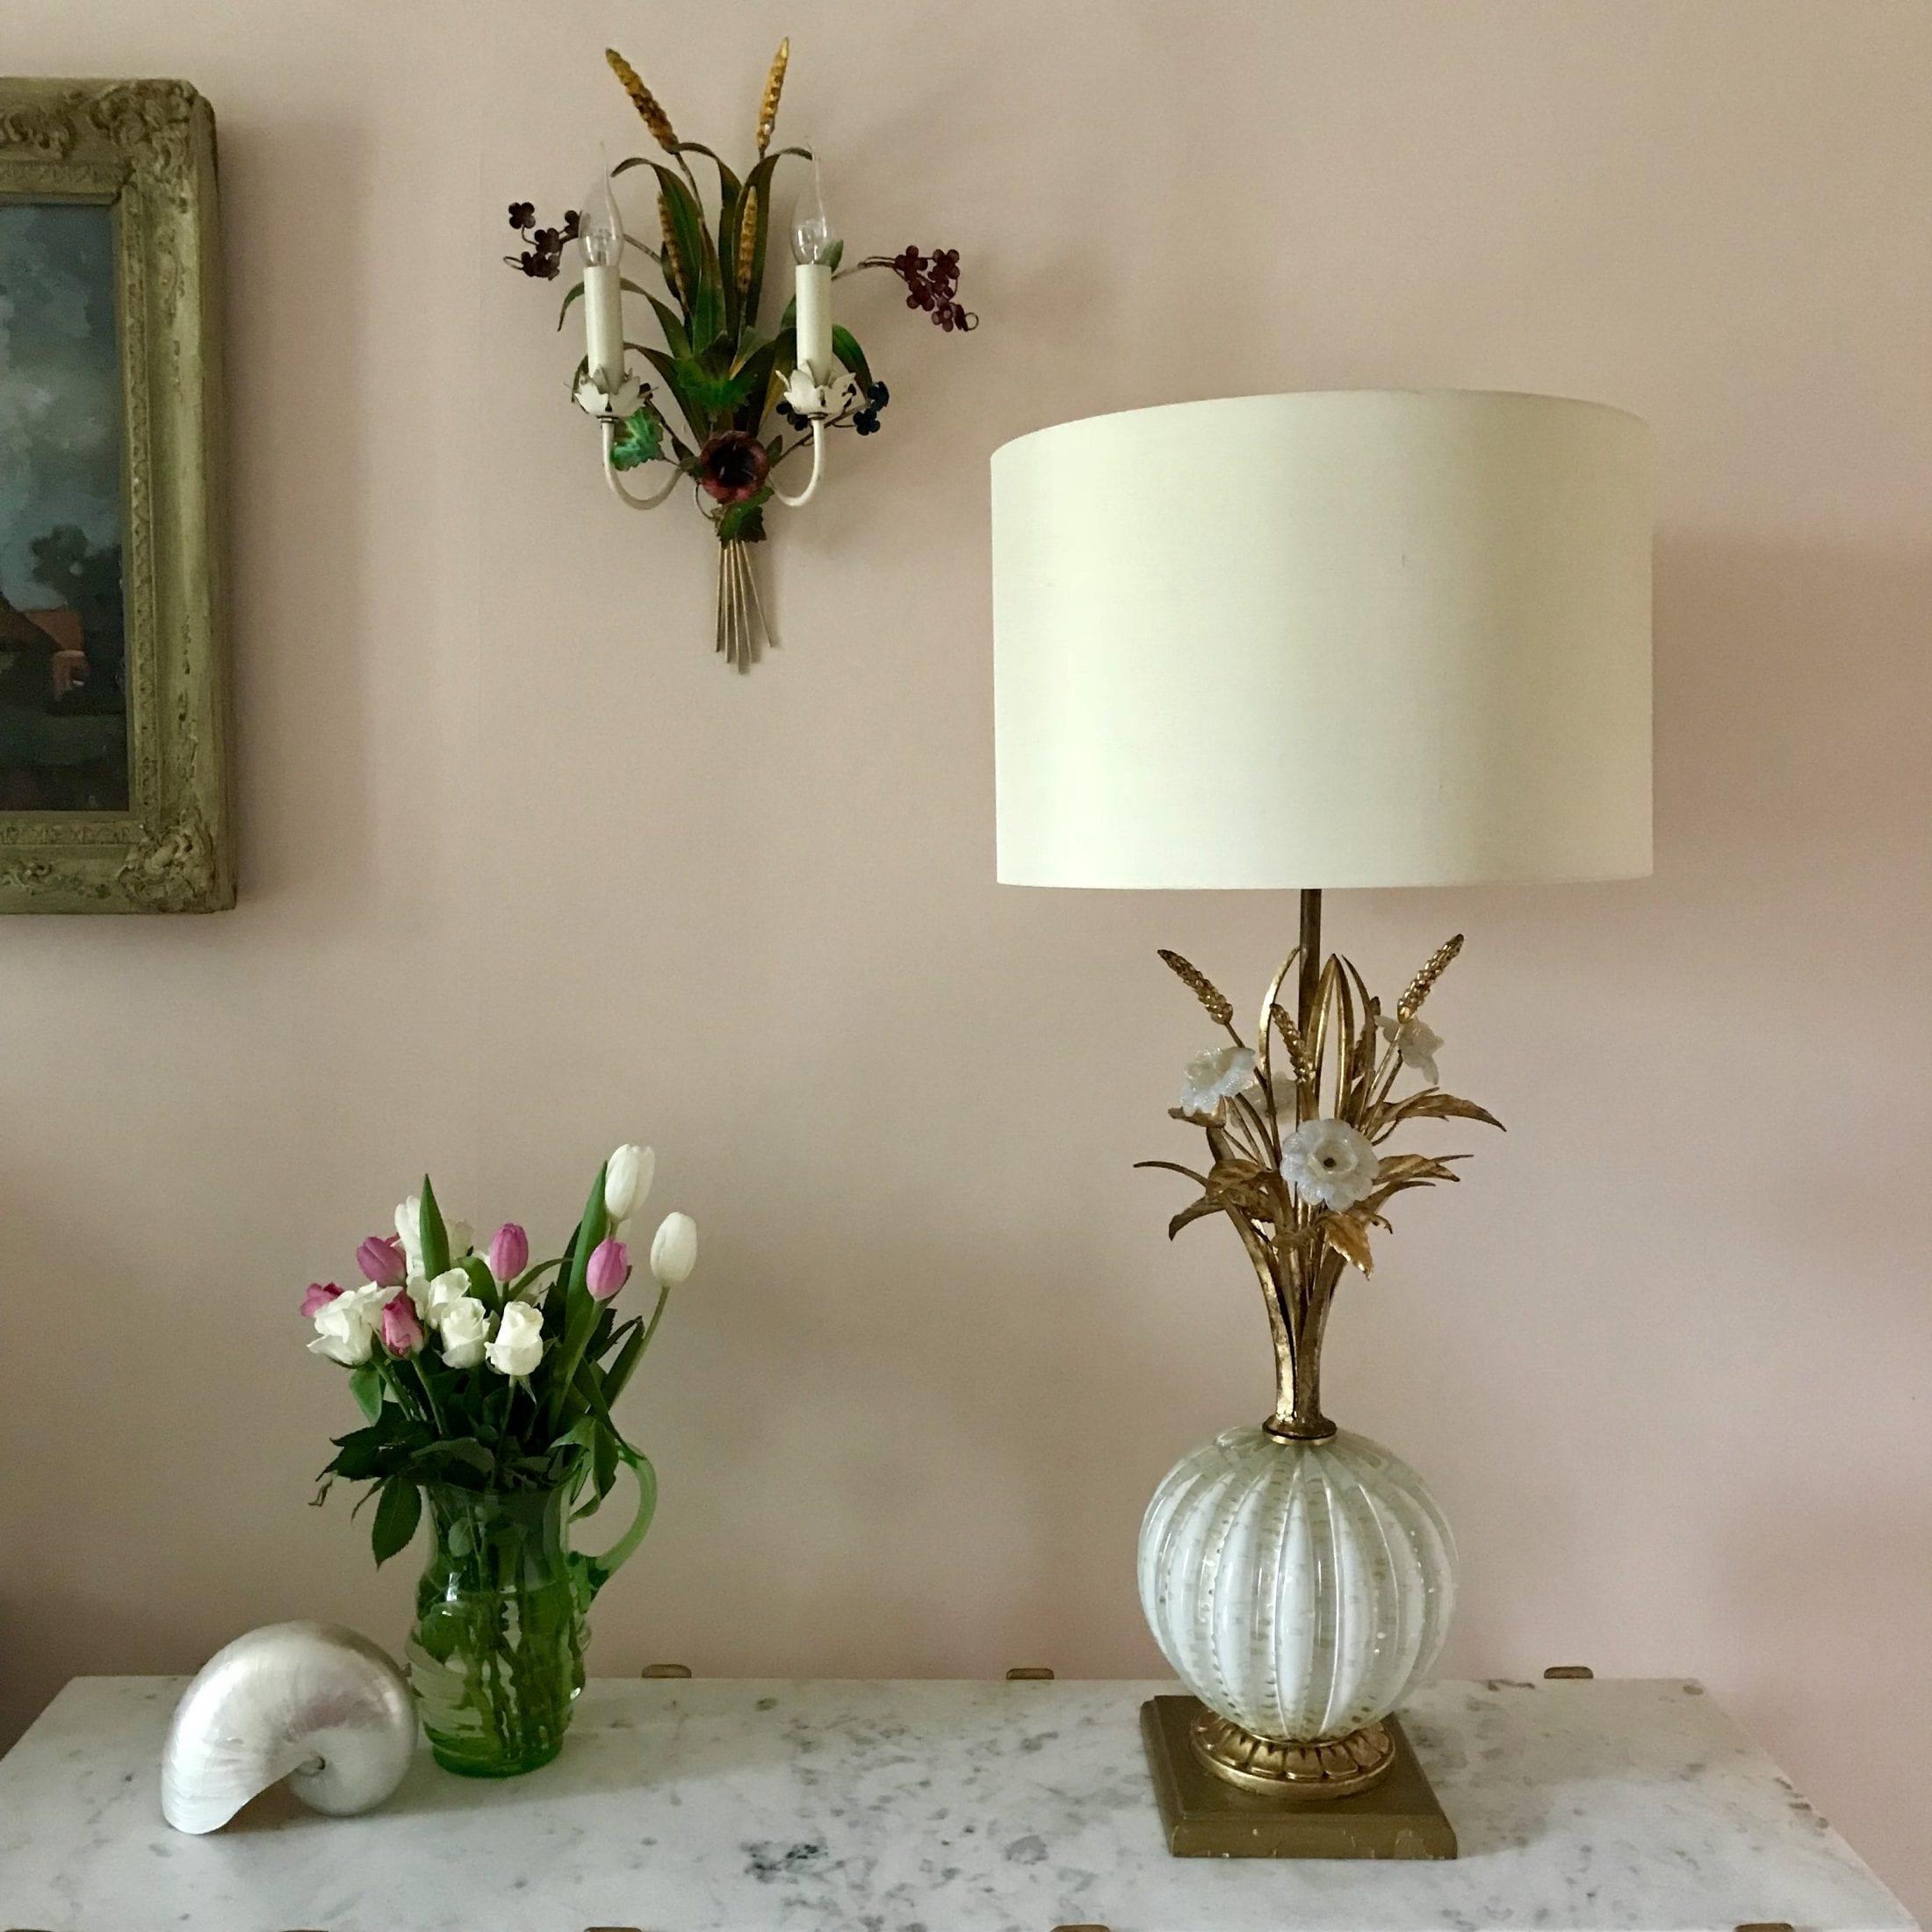 Barovier toso murano table lamp murano light main aloadofball Images